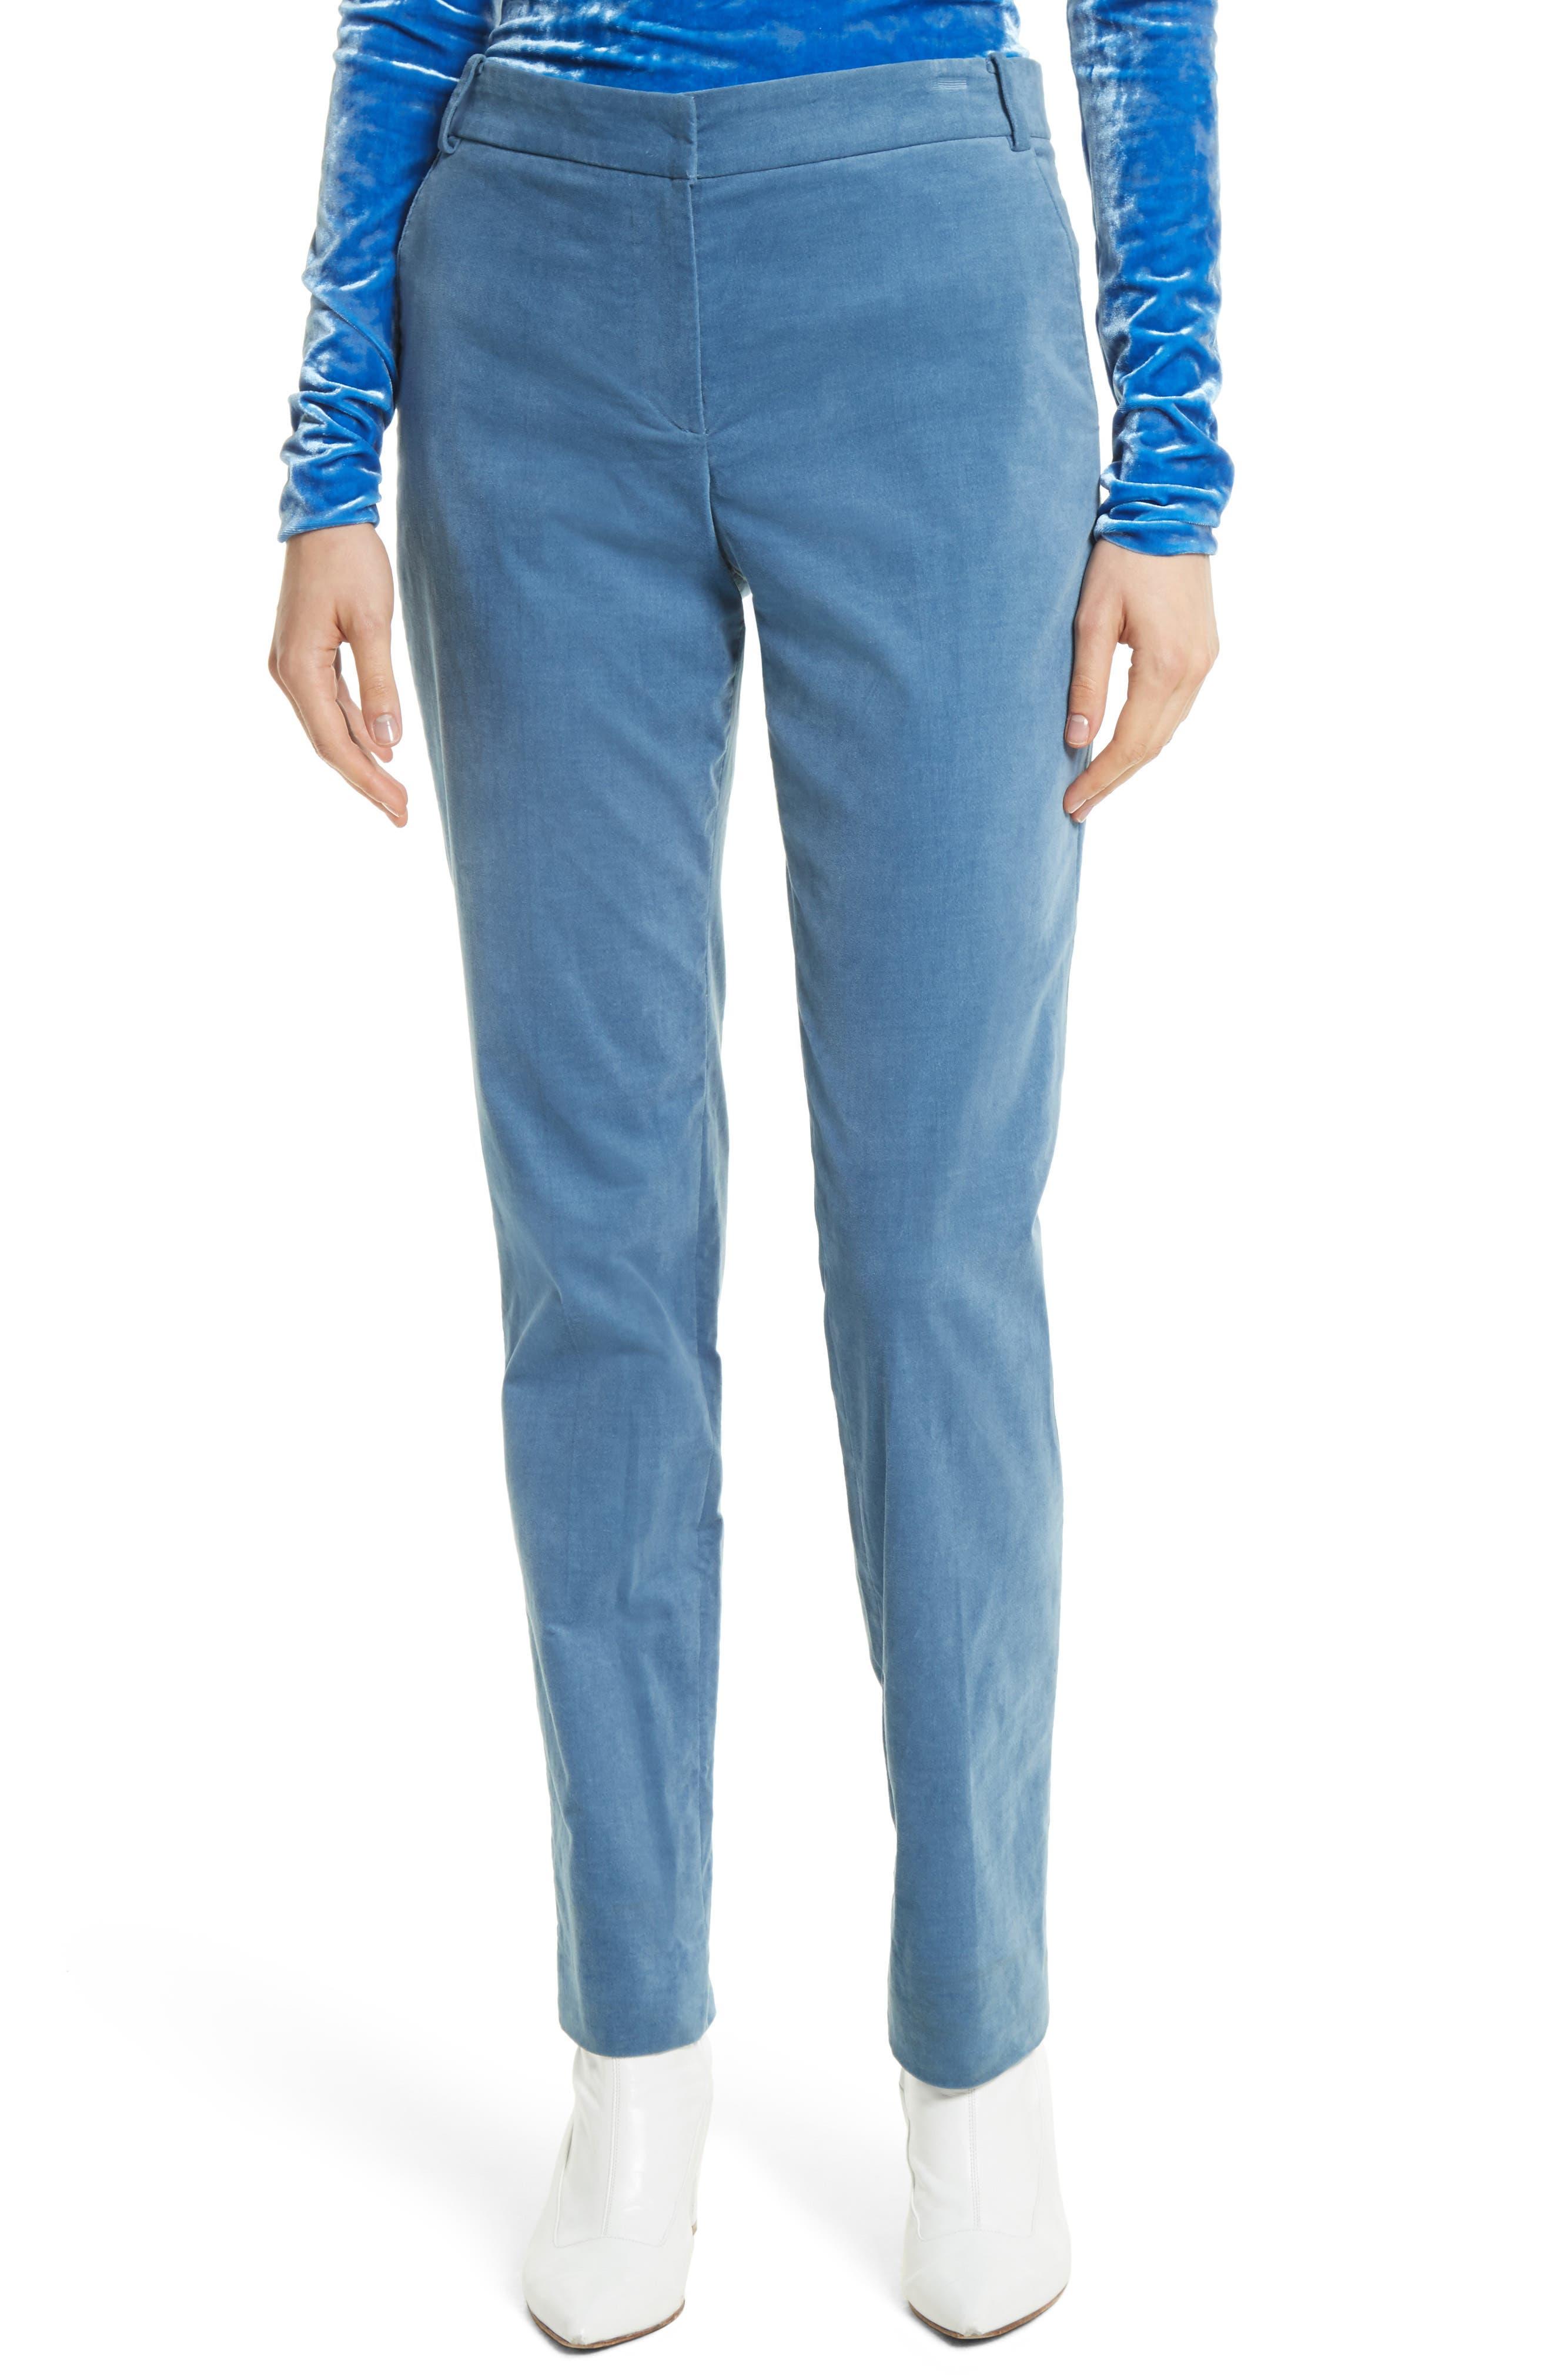 Moleskin Stretch Cotton Skinny Pants,                             Main thumbnail 1, color,                             Blue